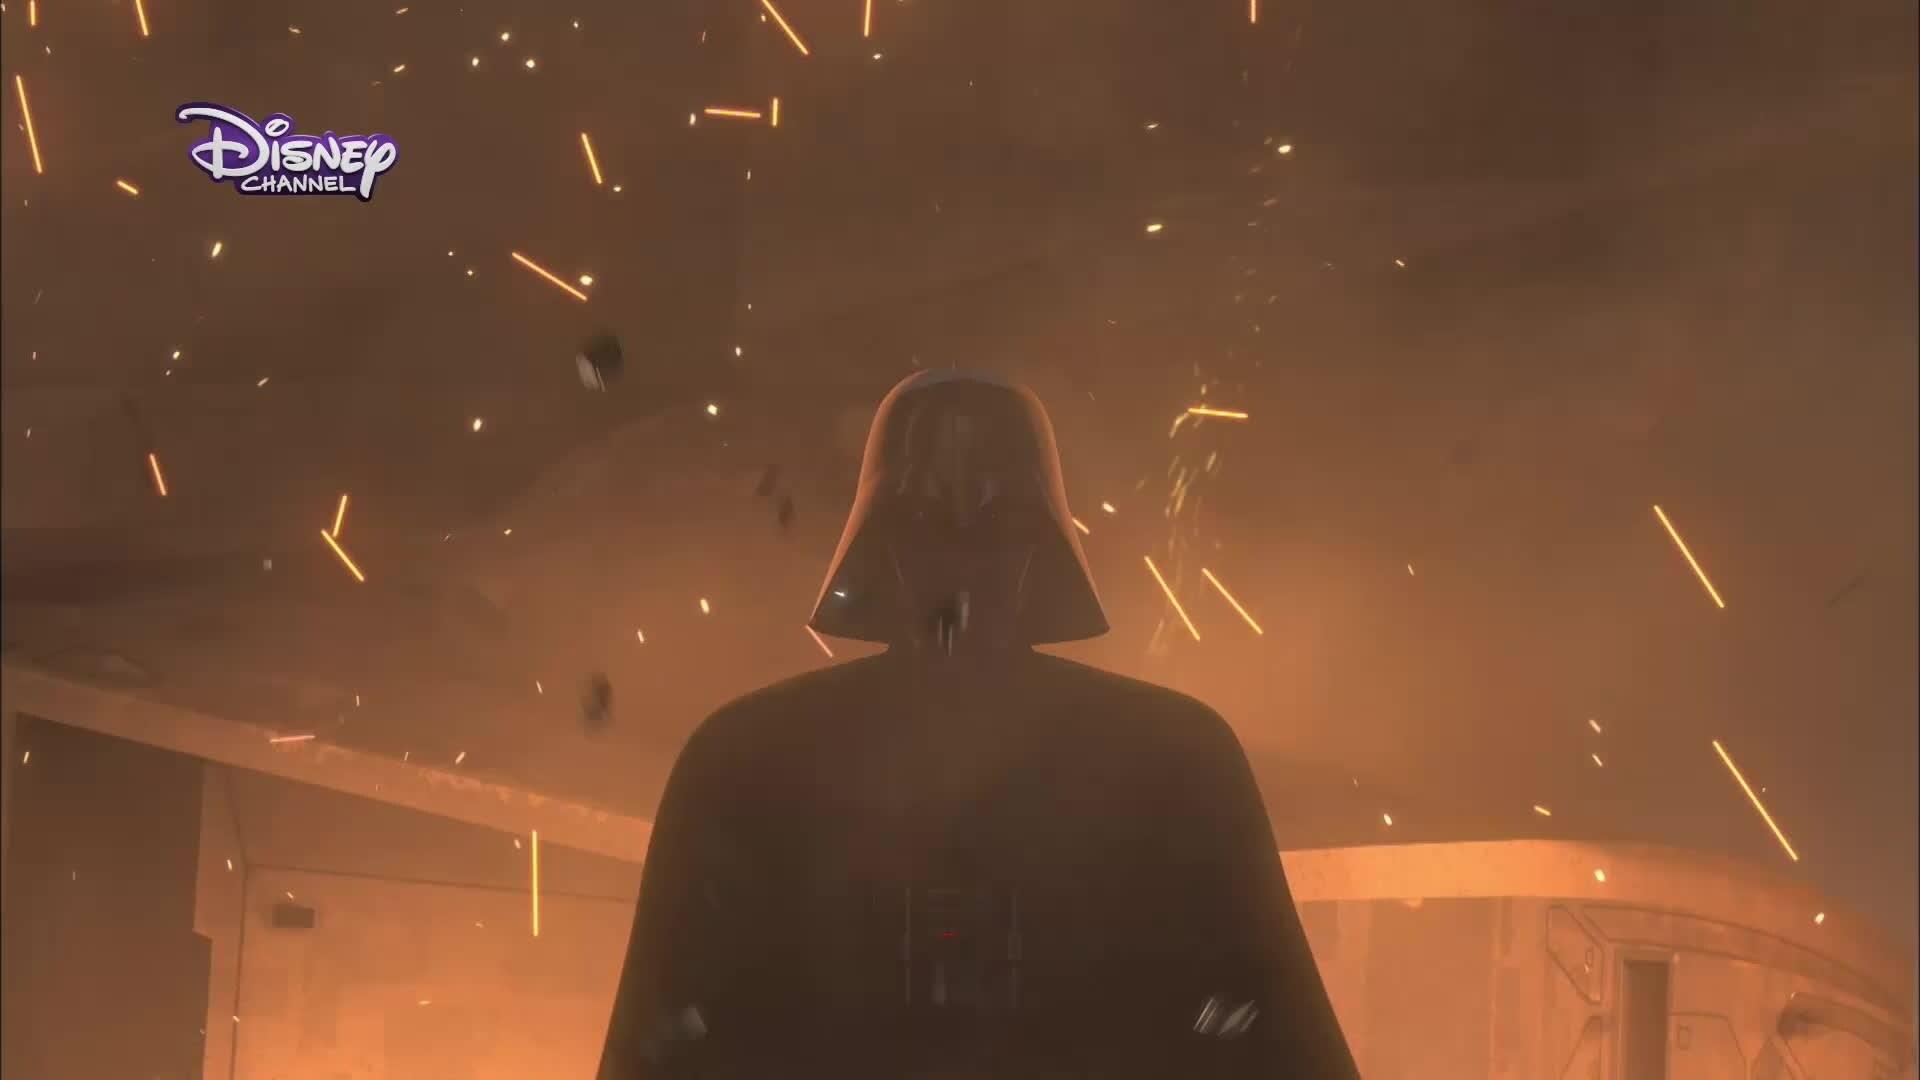 Star Wars Rebels - Darth Vader